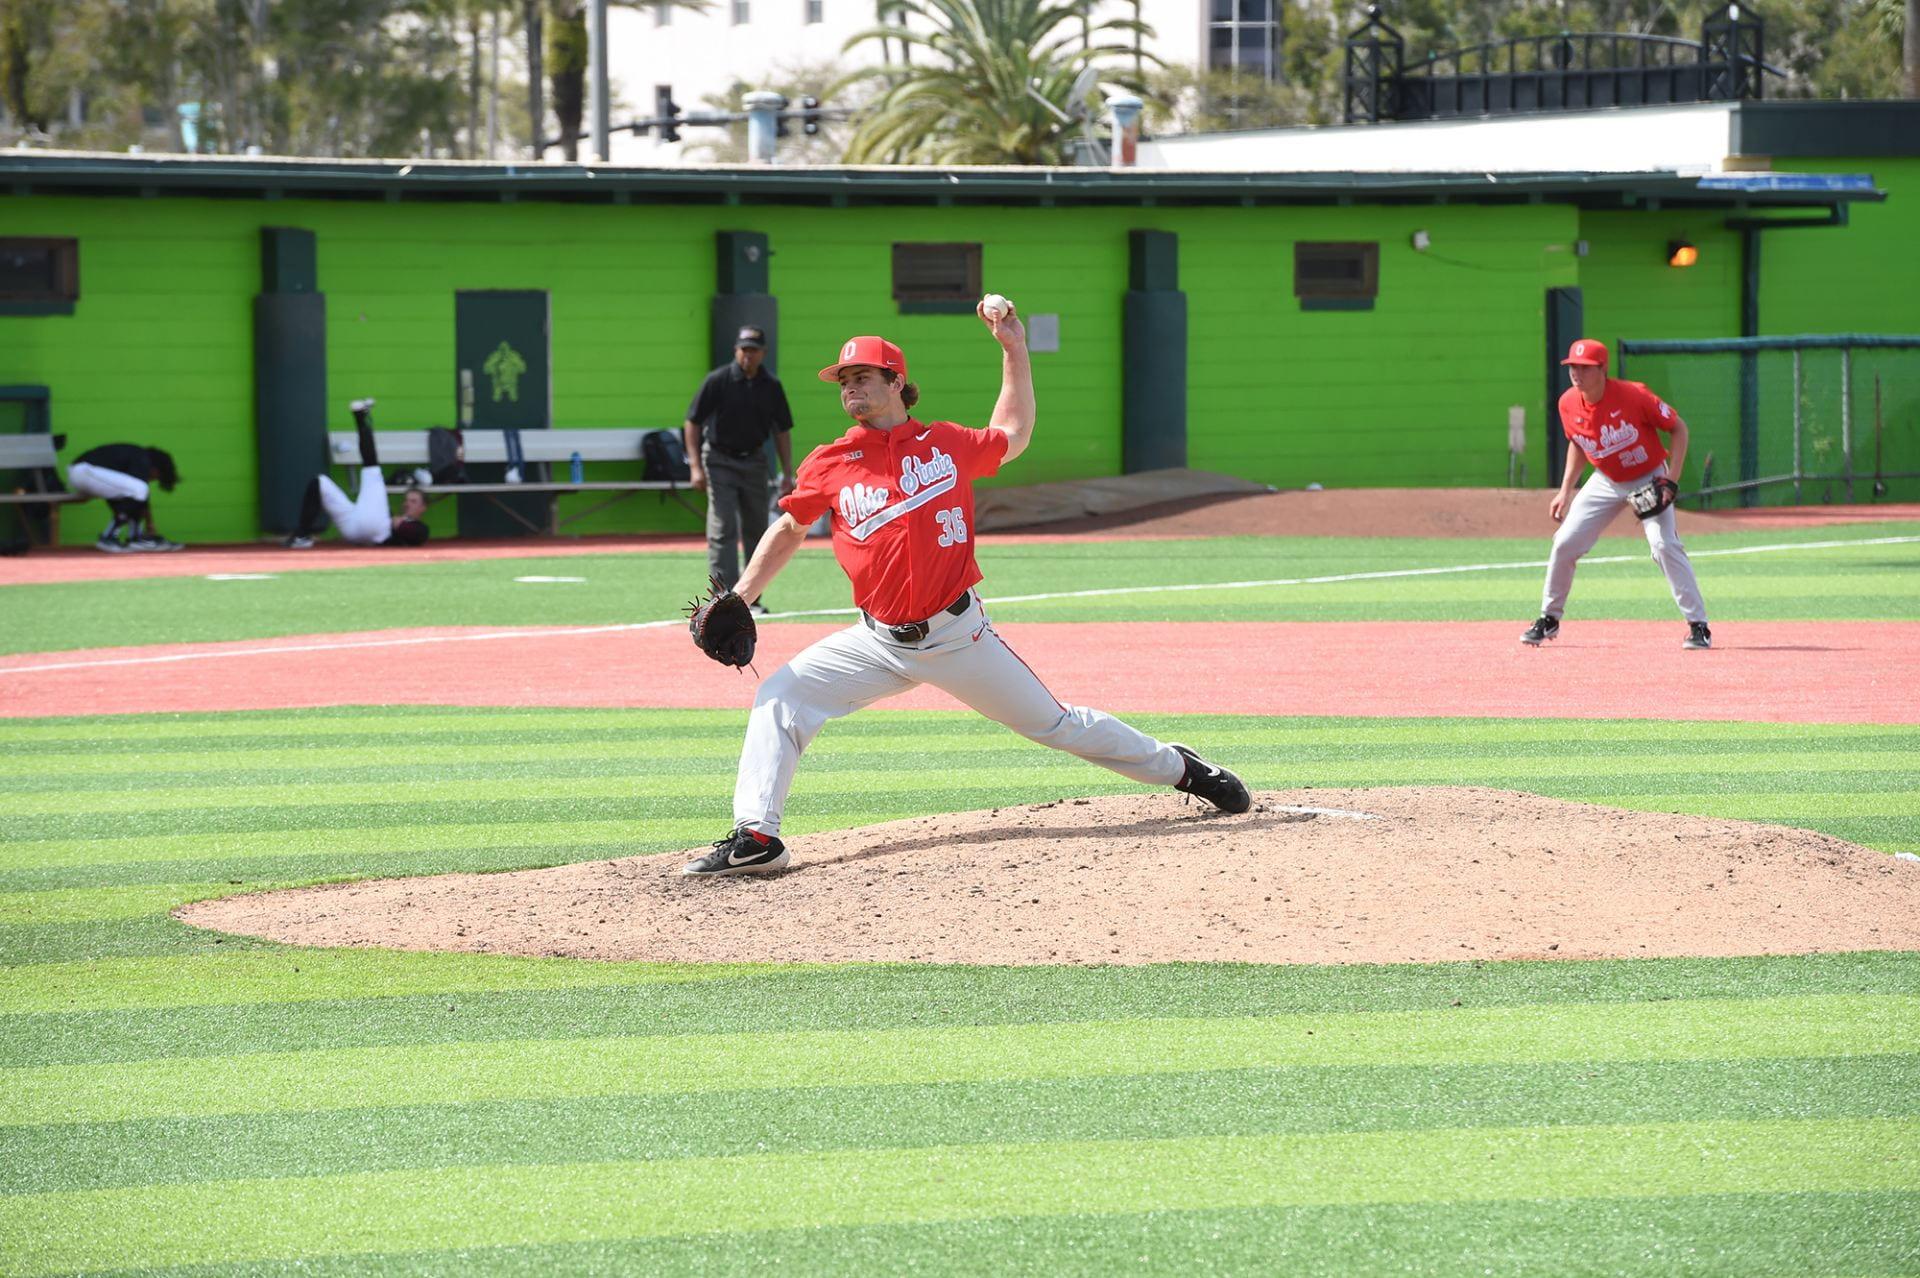 Baseball Two Ohio State Players Share Name High School The Lantern